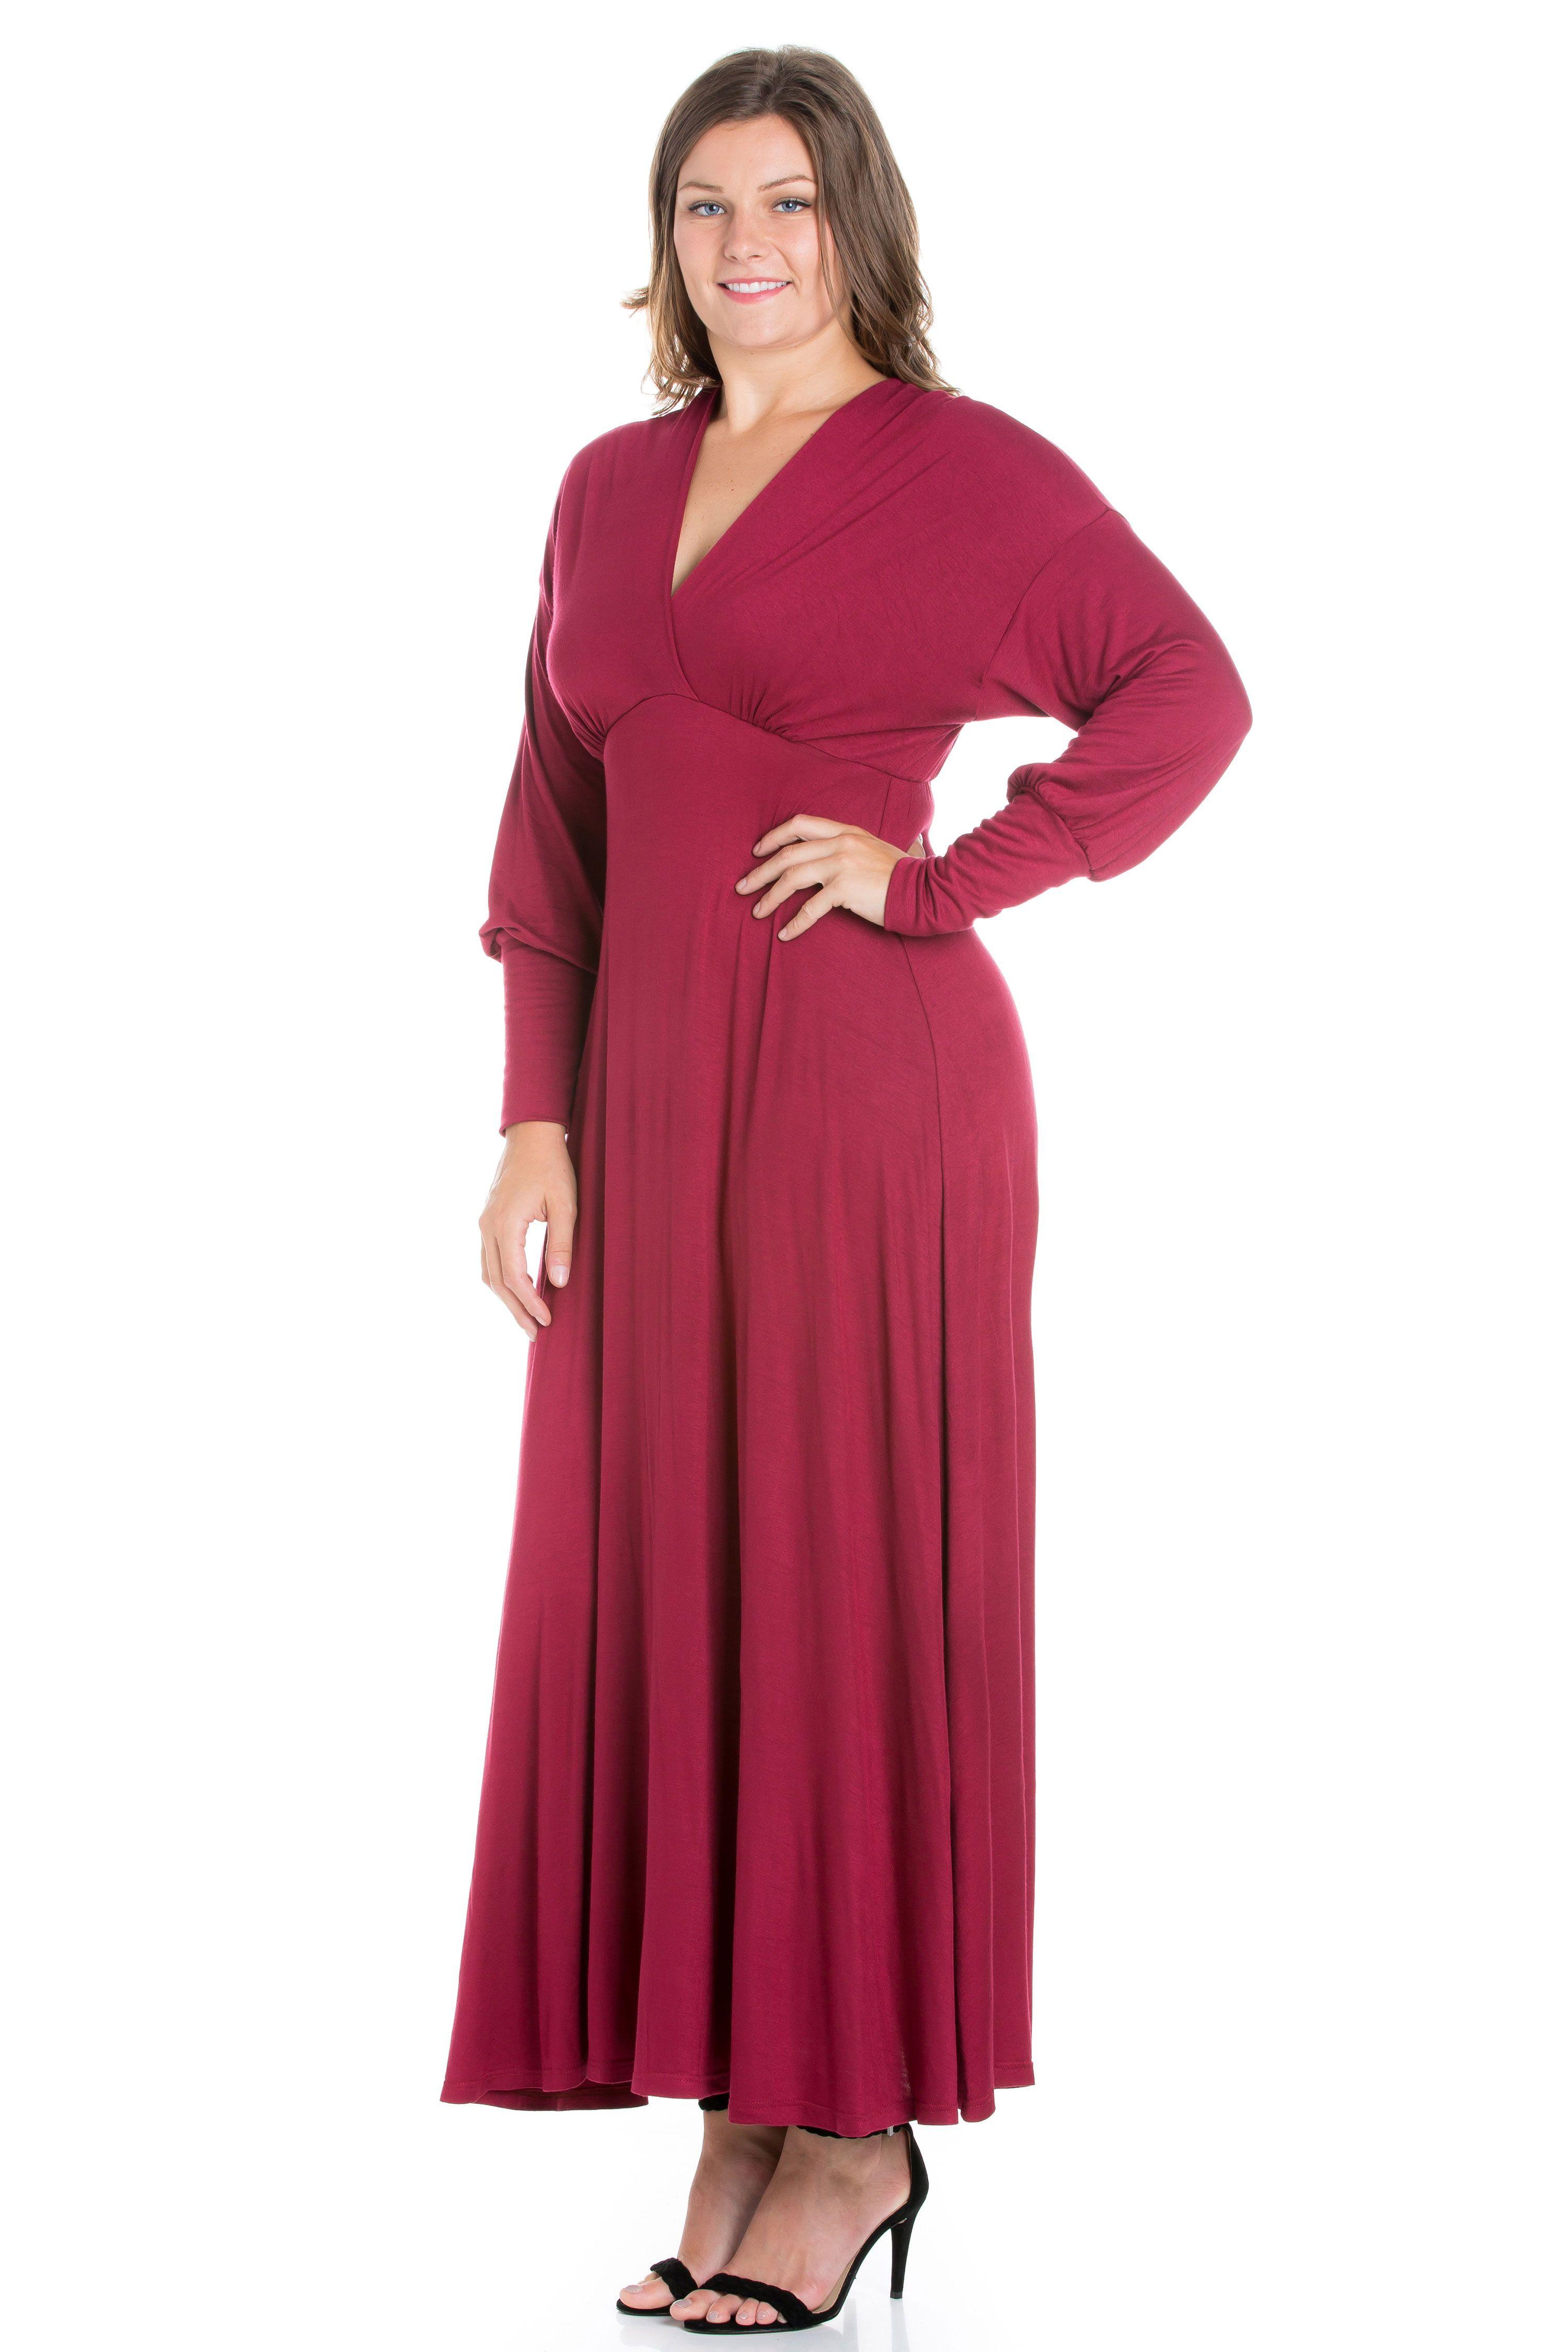 24 7 Comfort Apparel 24 7 Women S Plus Size Comfort Apparel Elbow Length Sleeve Plus Size Maxi Dress Walmart Com Maxi Dress With Sleeves Plus Size Maxi Dresses Maxi Dress [ 4500 x 3000 Pixel ]